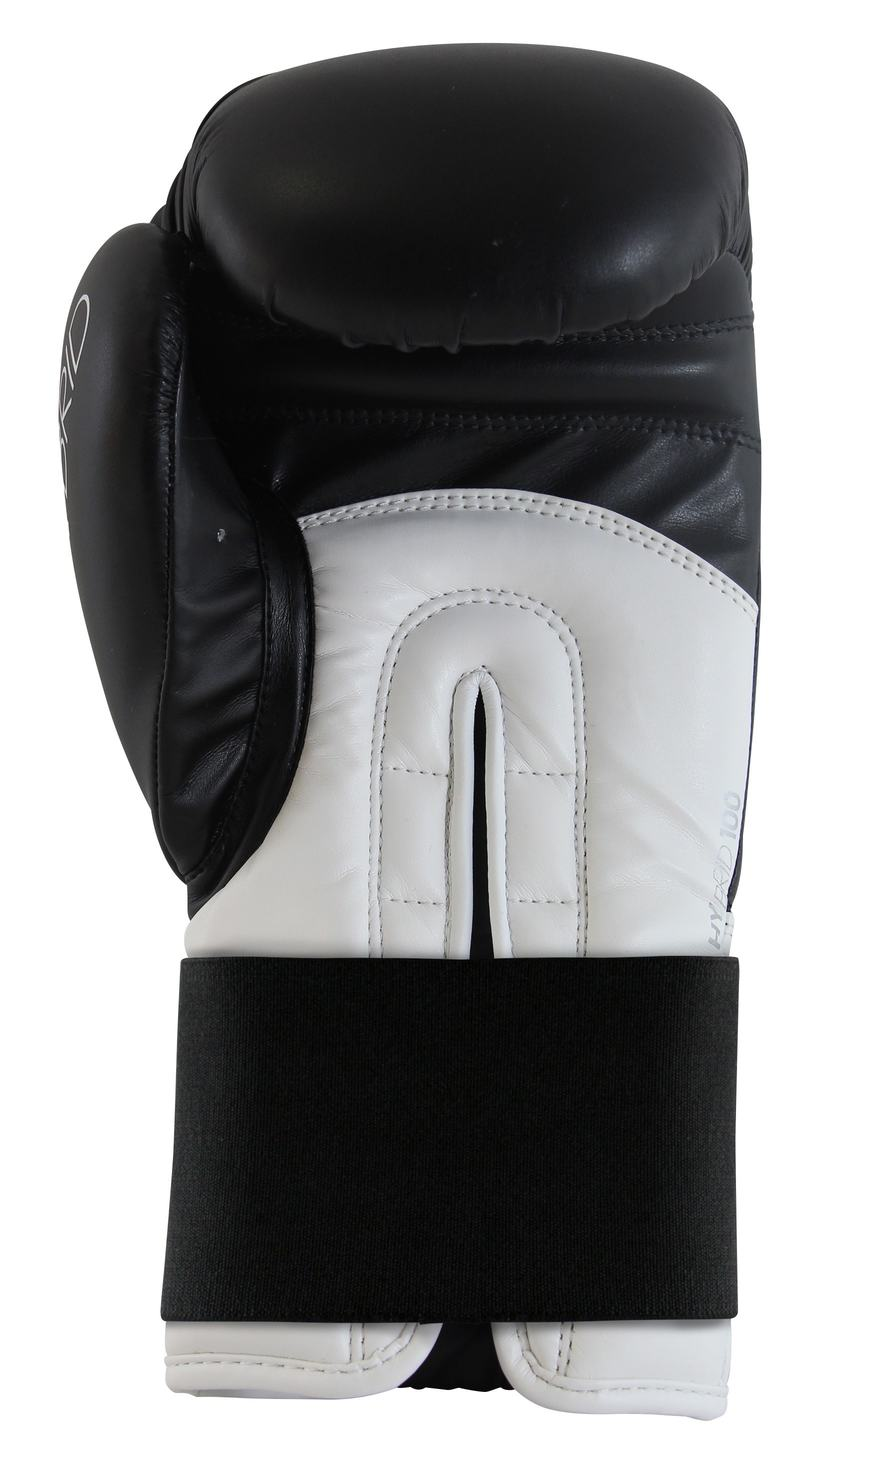 Luva de Boxe adidas Hybrid 100 Preta/Branca